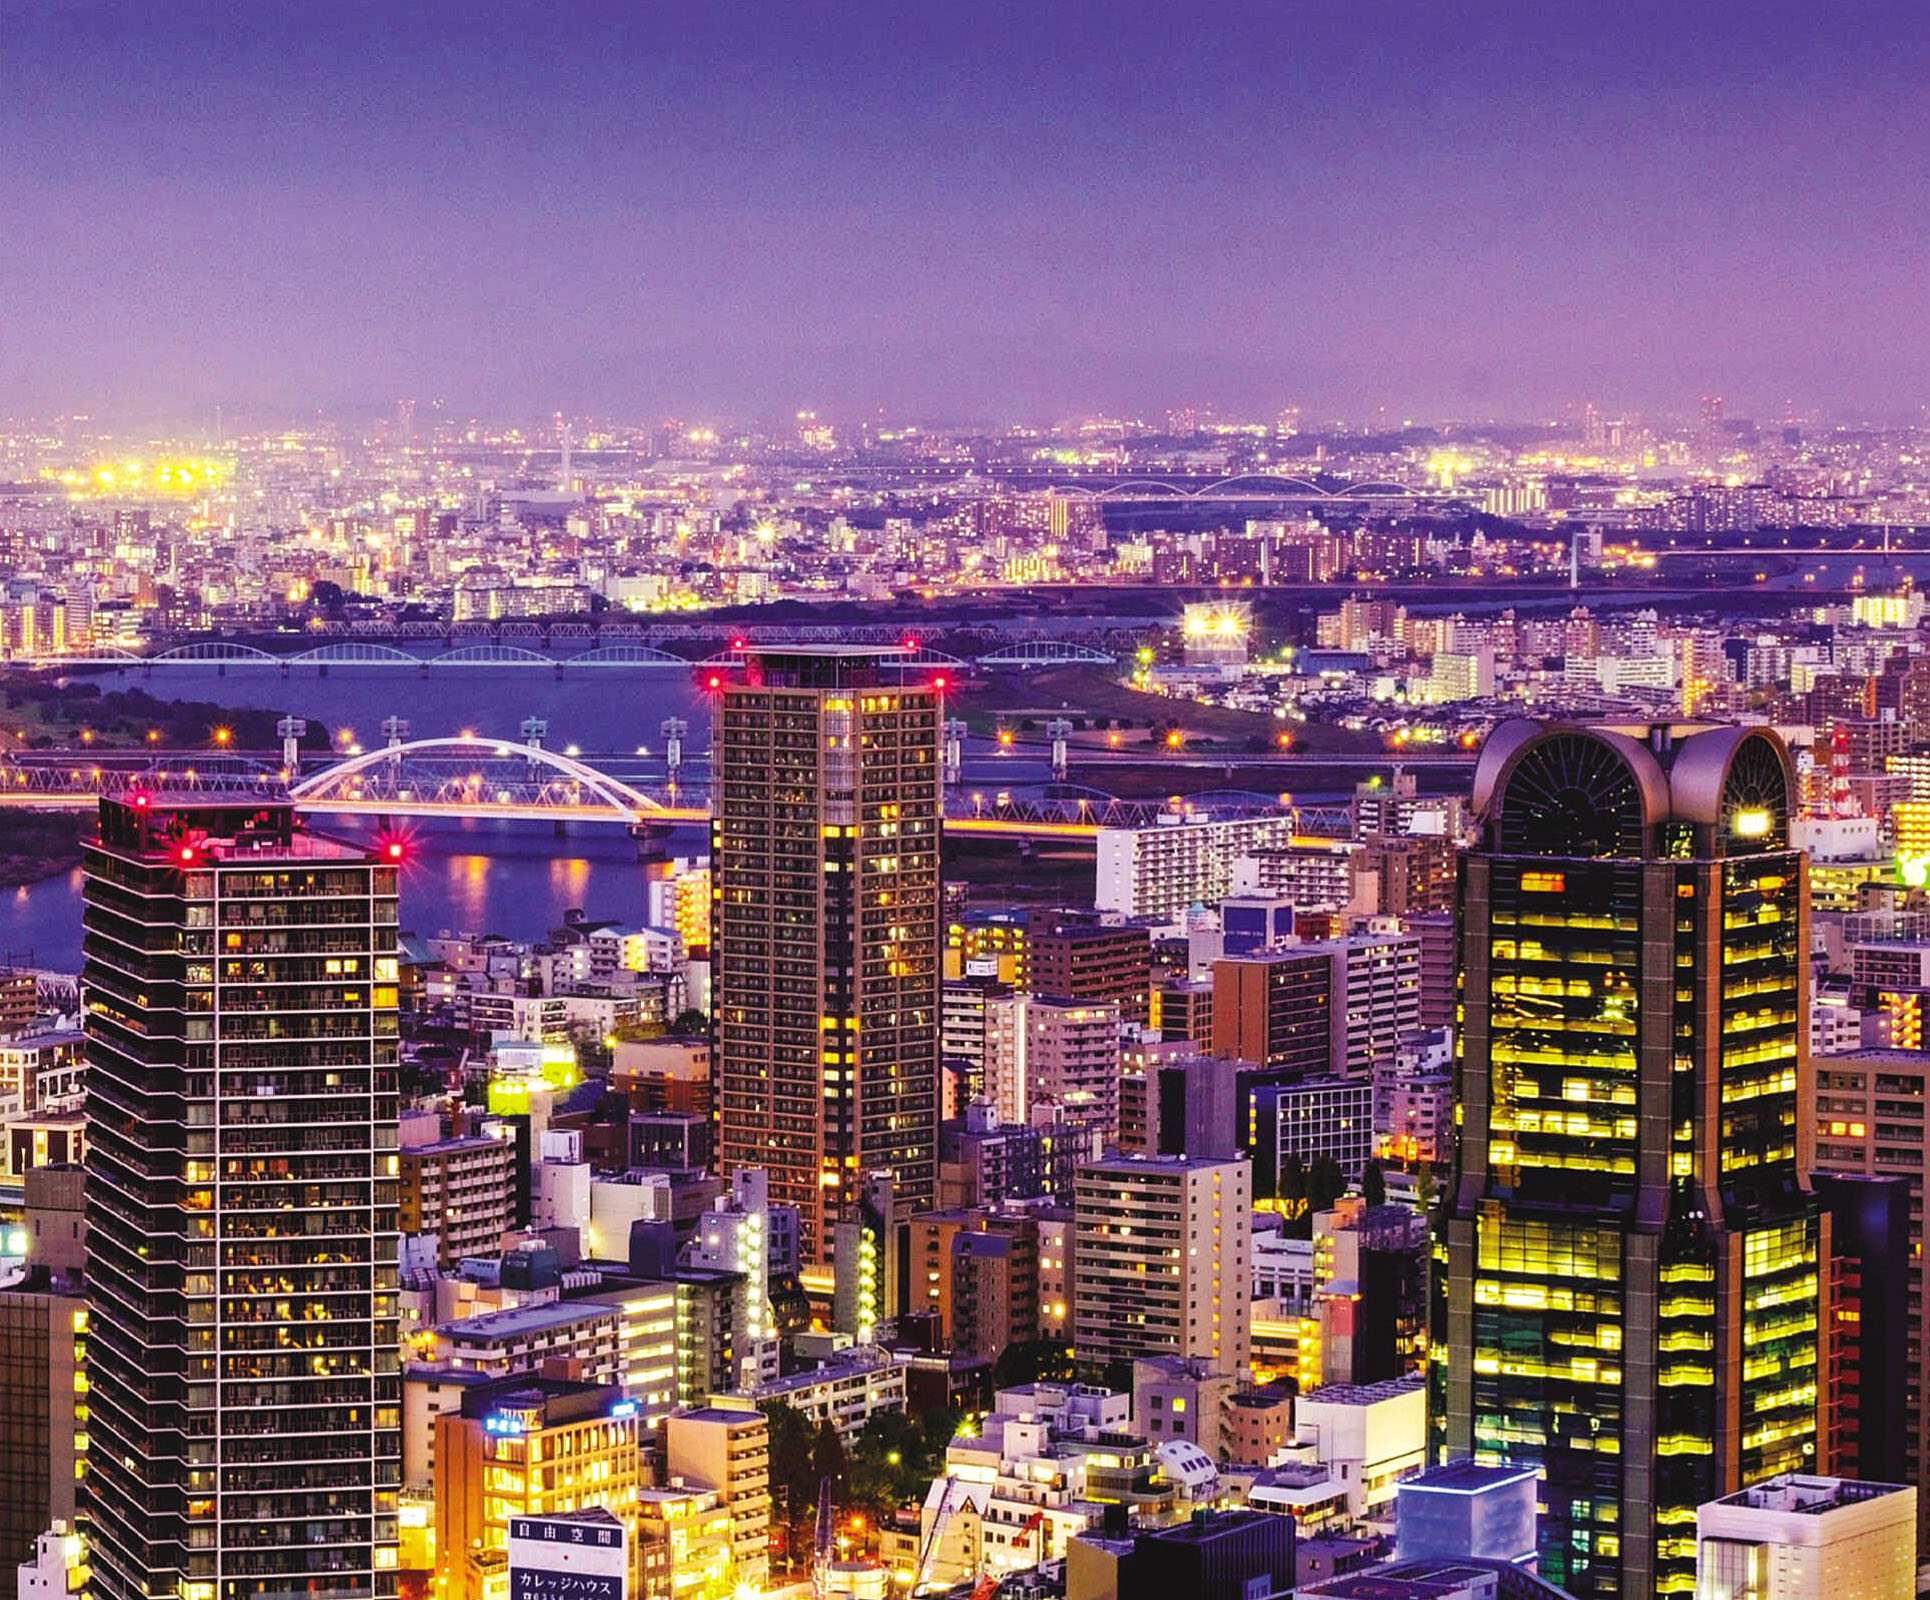 Osaka by Patchiya Wasitworapol.jpg